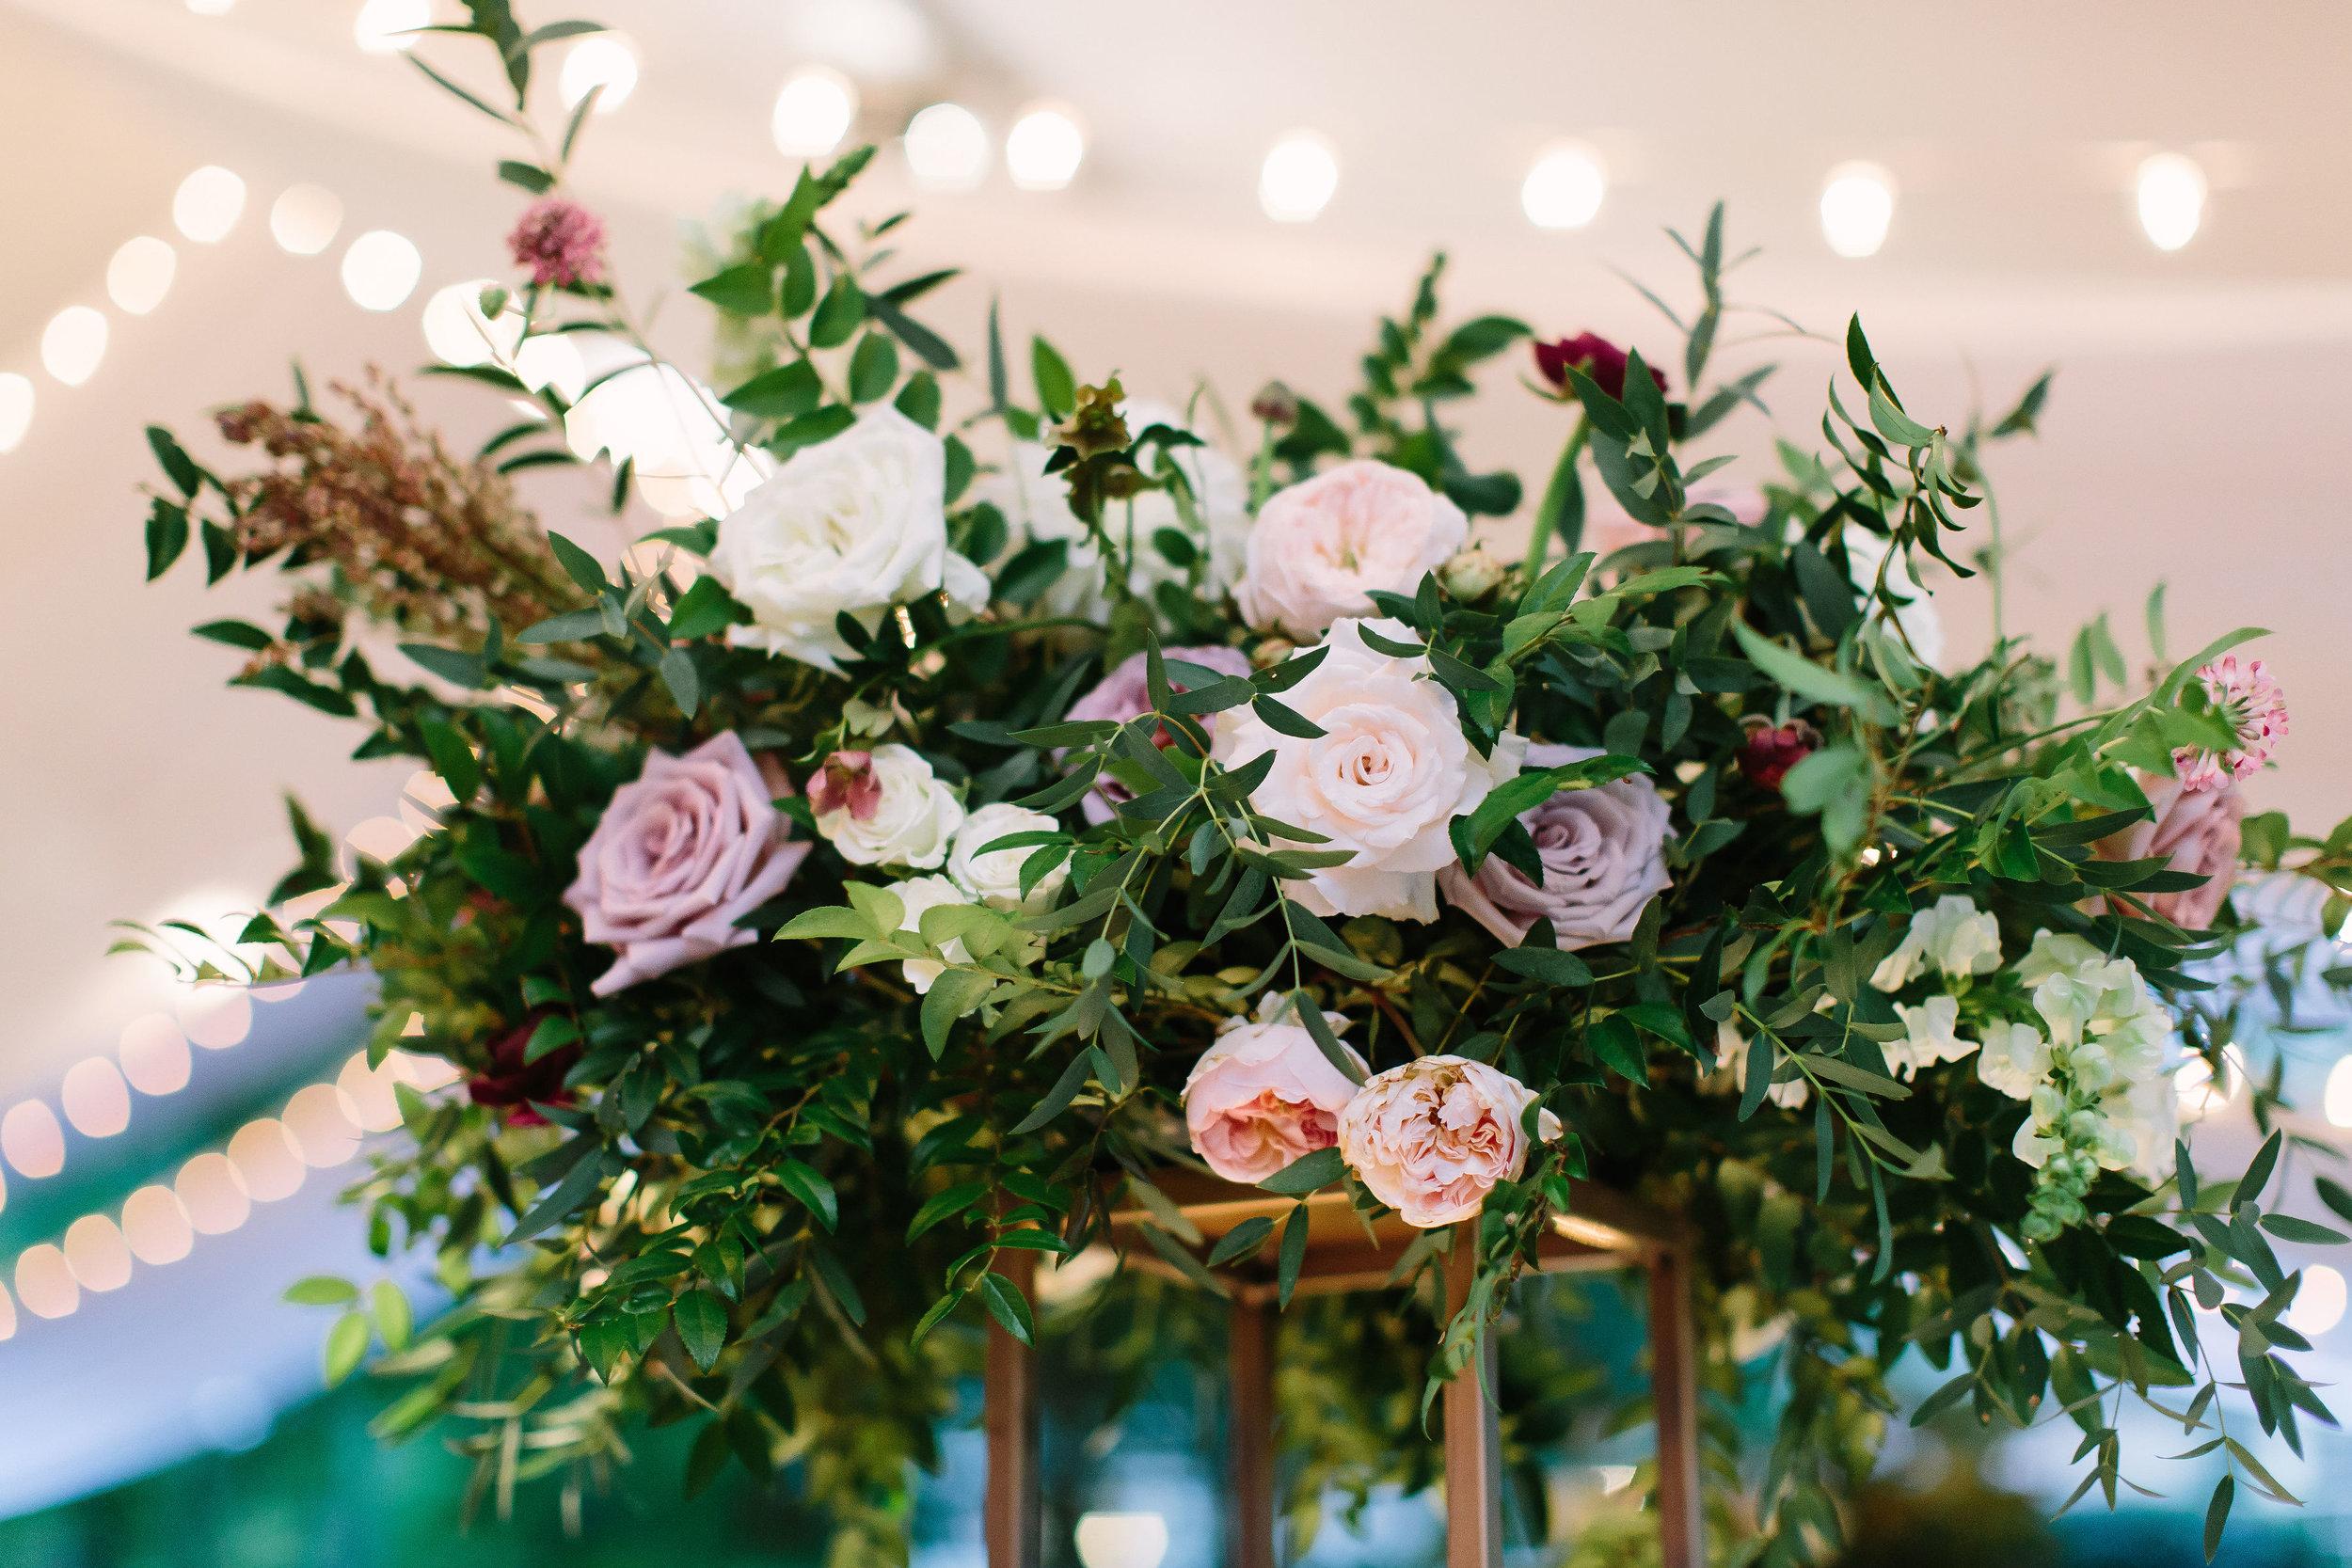 Organic, garden-inspired floral centerpiece of garden roses, ranunculus, and lush greenery // Nashville Wedding Florist